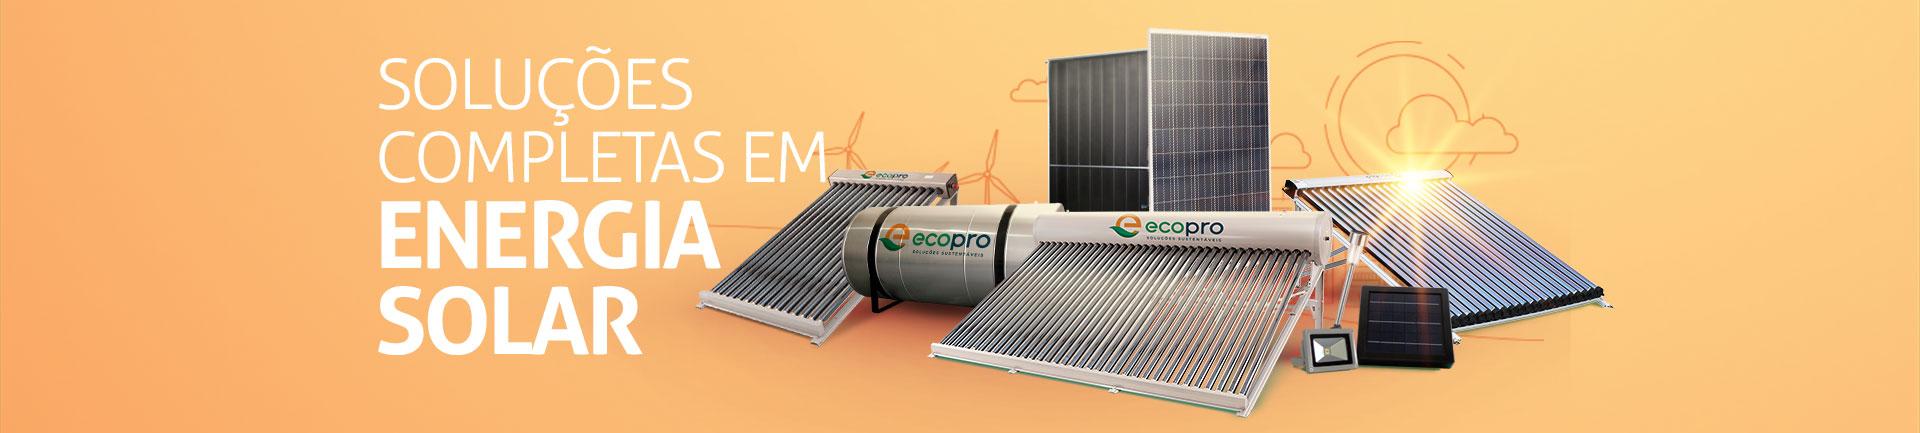 Ecopro Soluções em Energia Solar